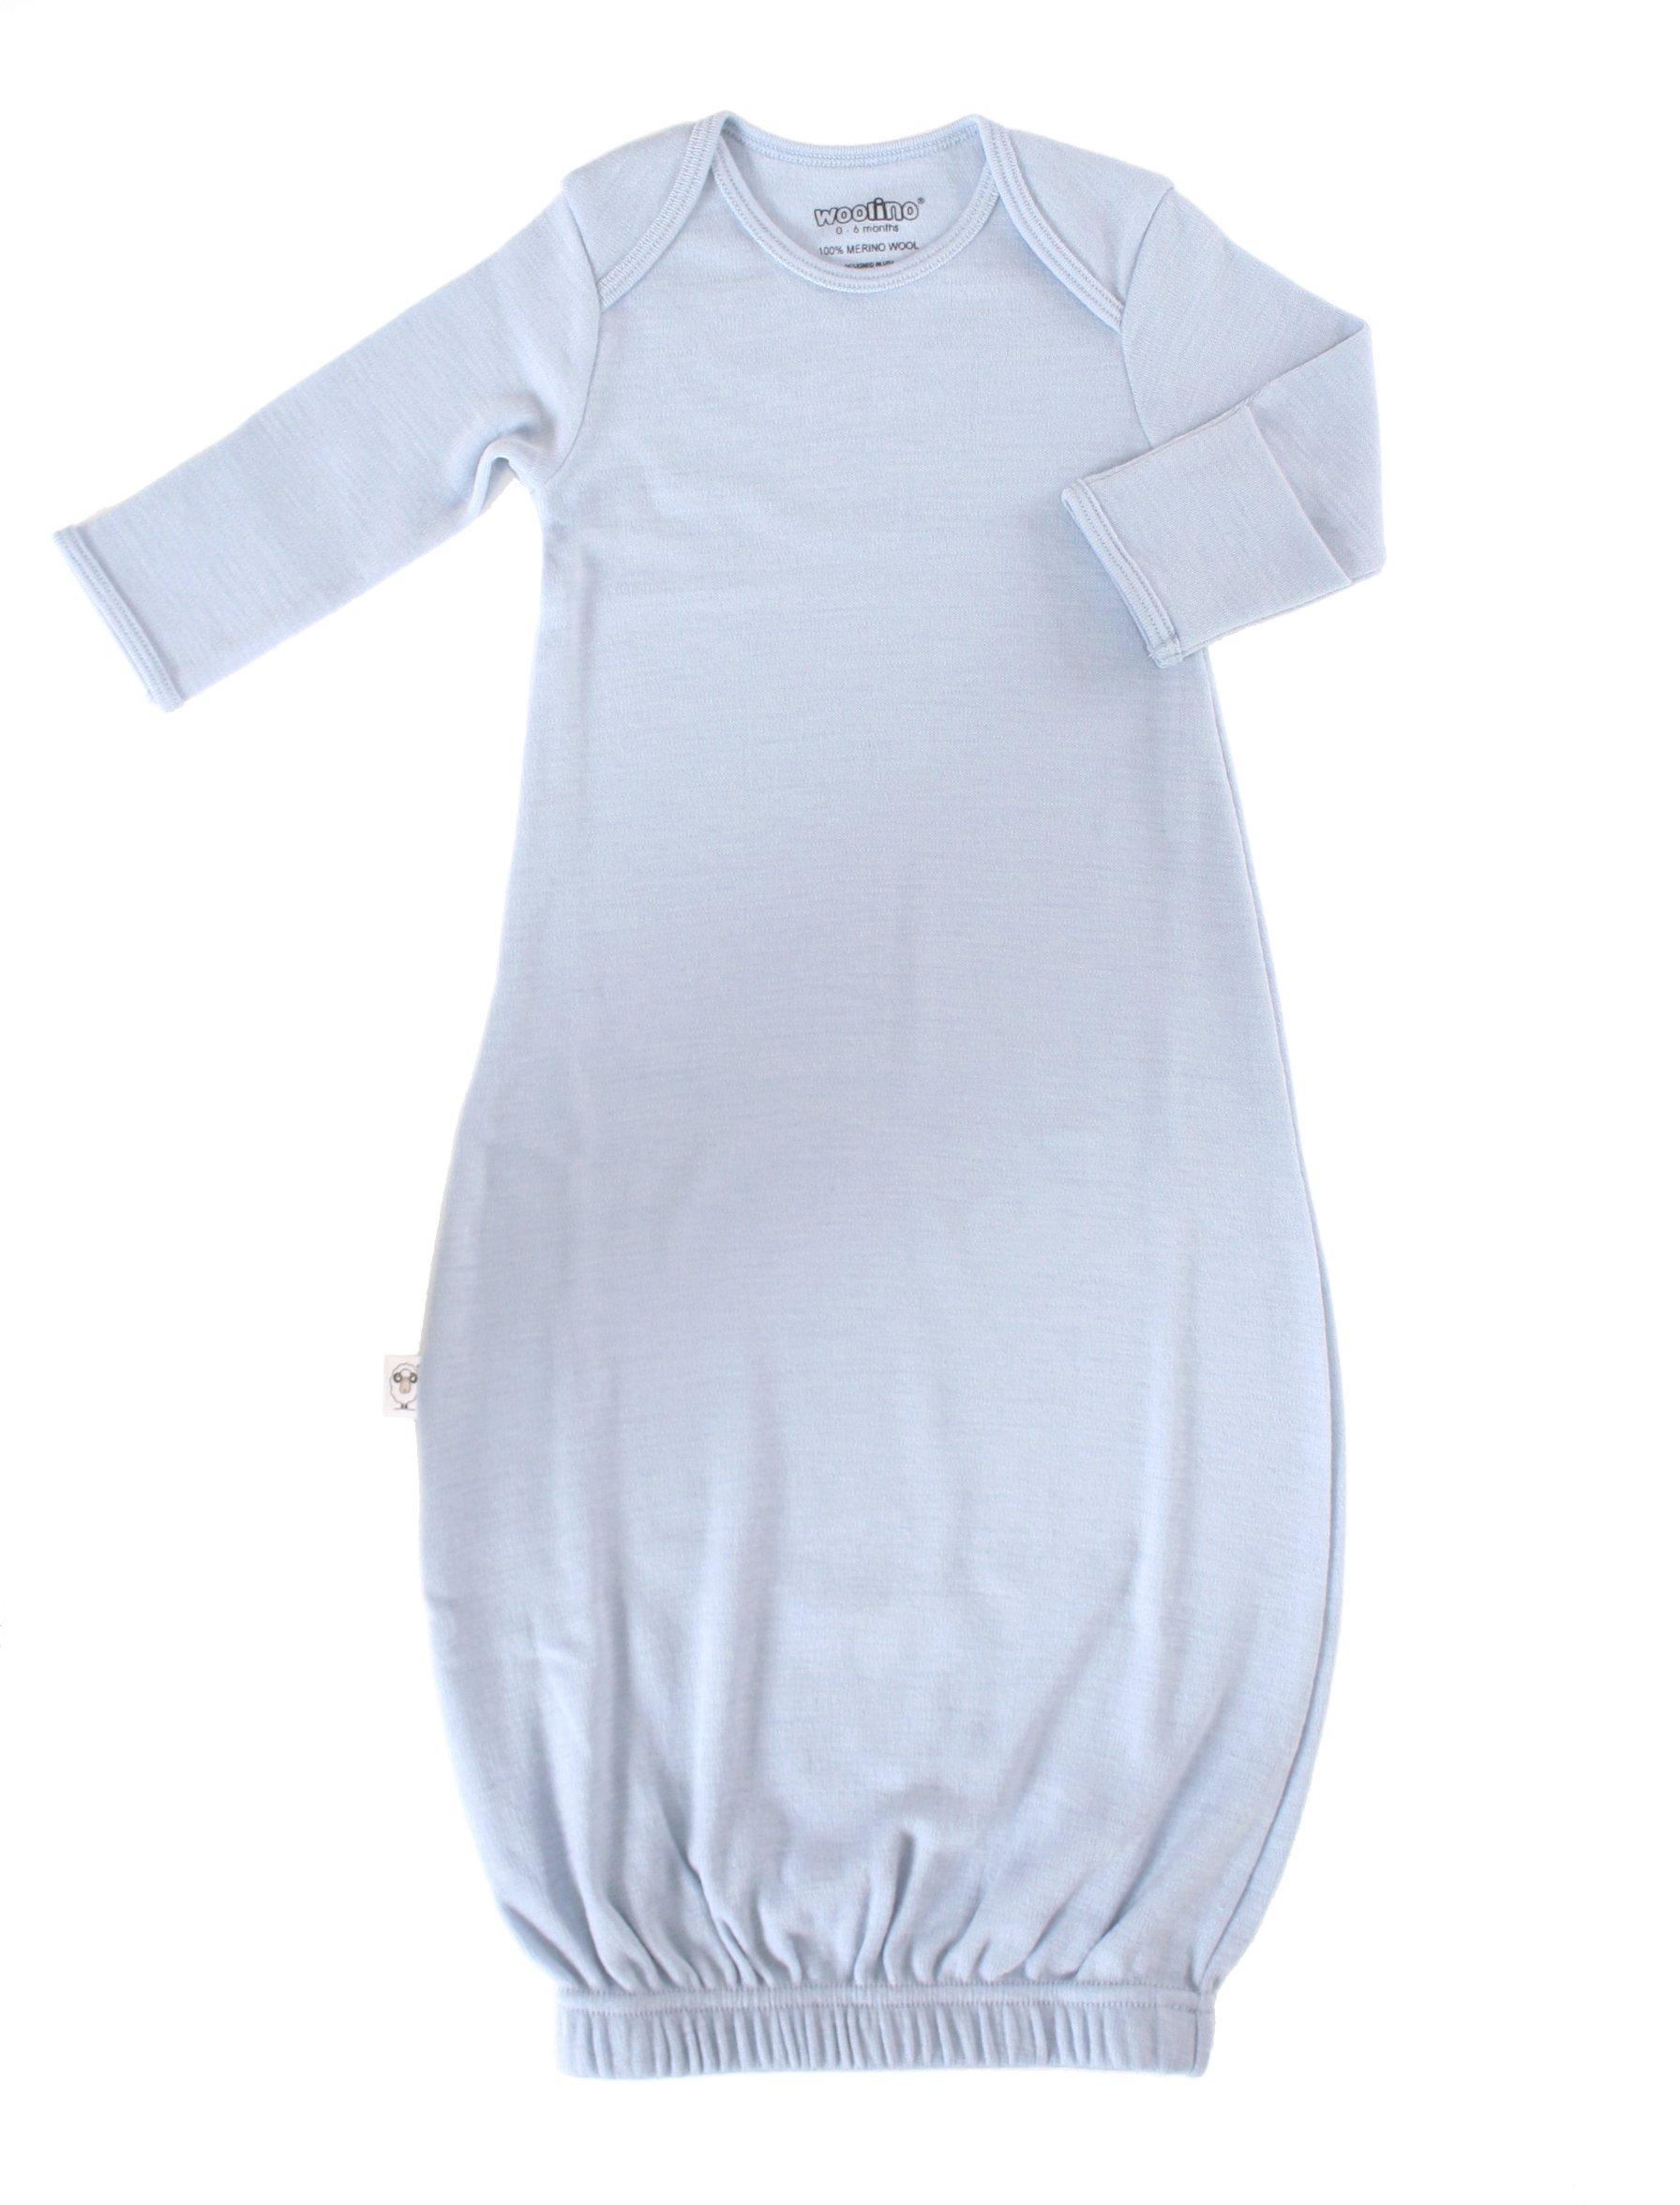 Woolino Infant Baby Boys Gown, 100% Superfine Merino Wool, 0-6 Months, Blue